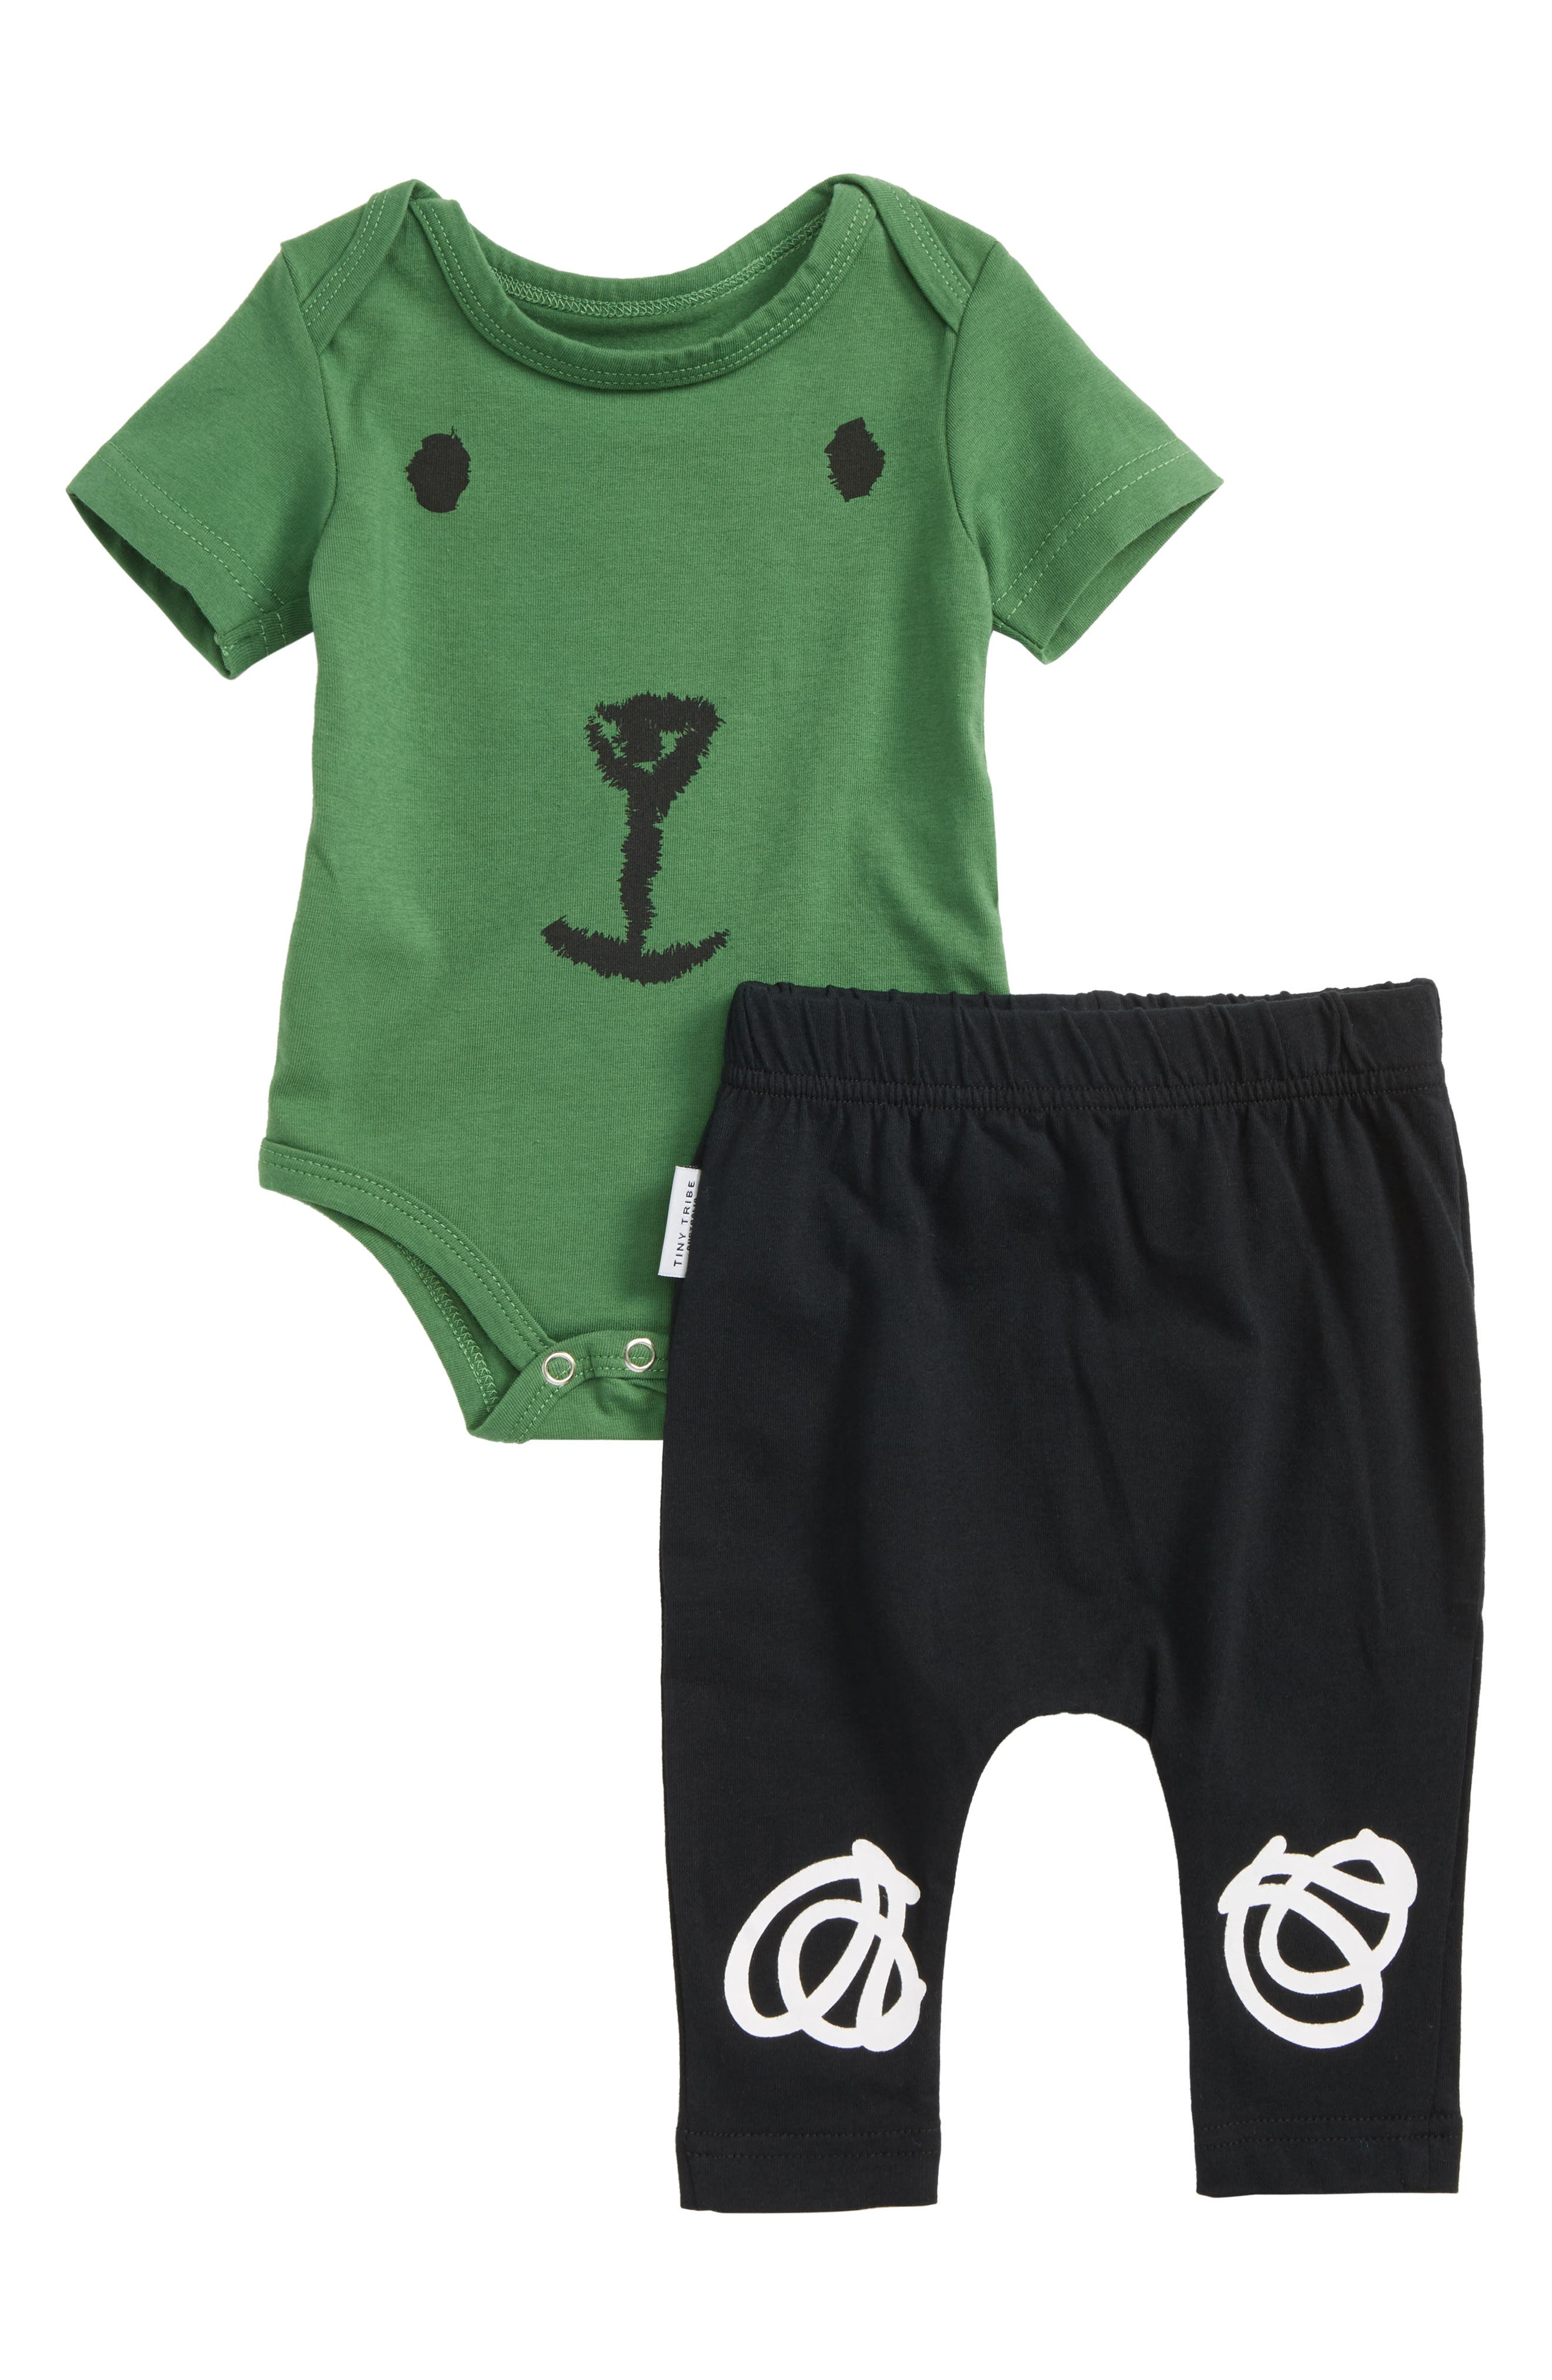 Honeybear Bodysuit & Pants Set,                         Main,                         color, Green/ Black